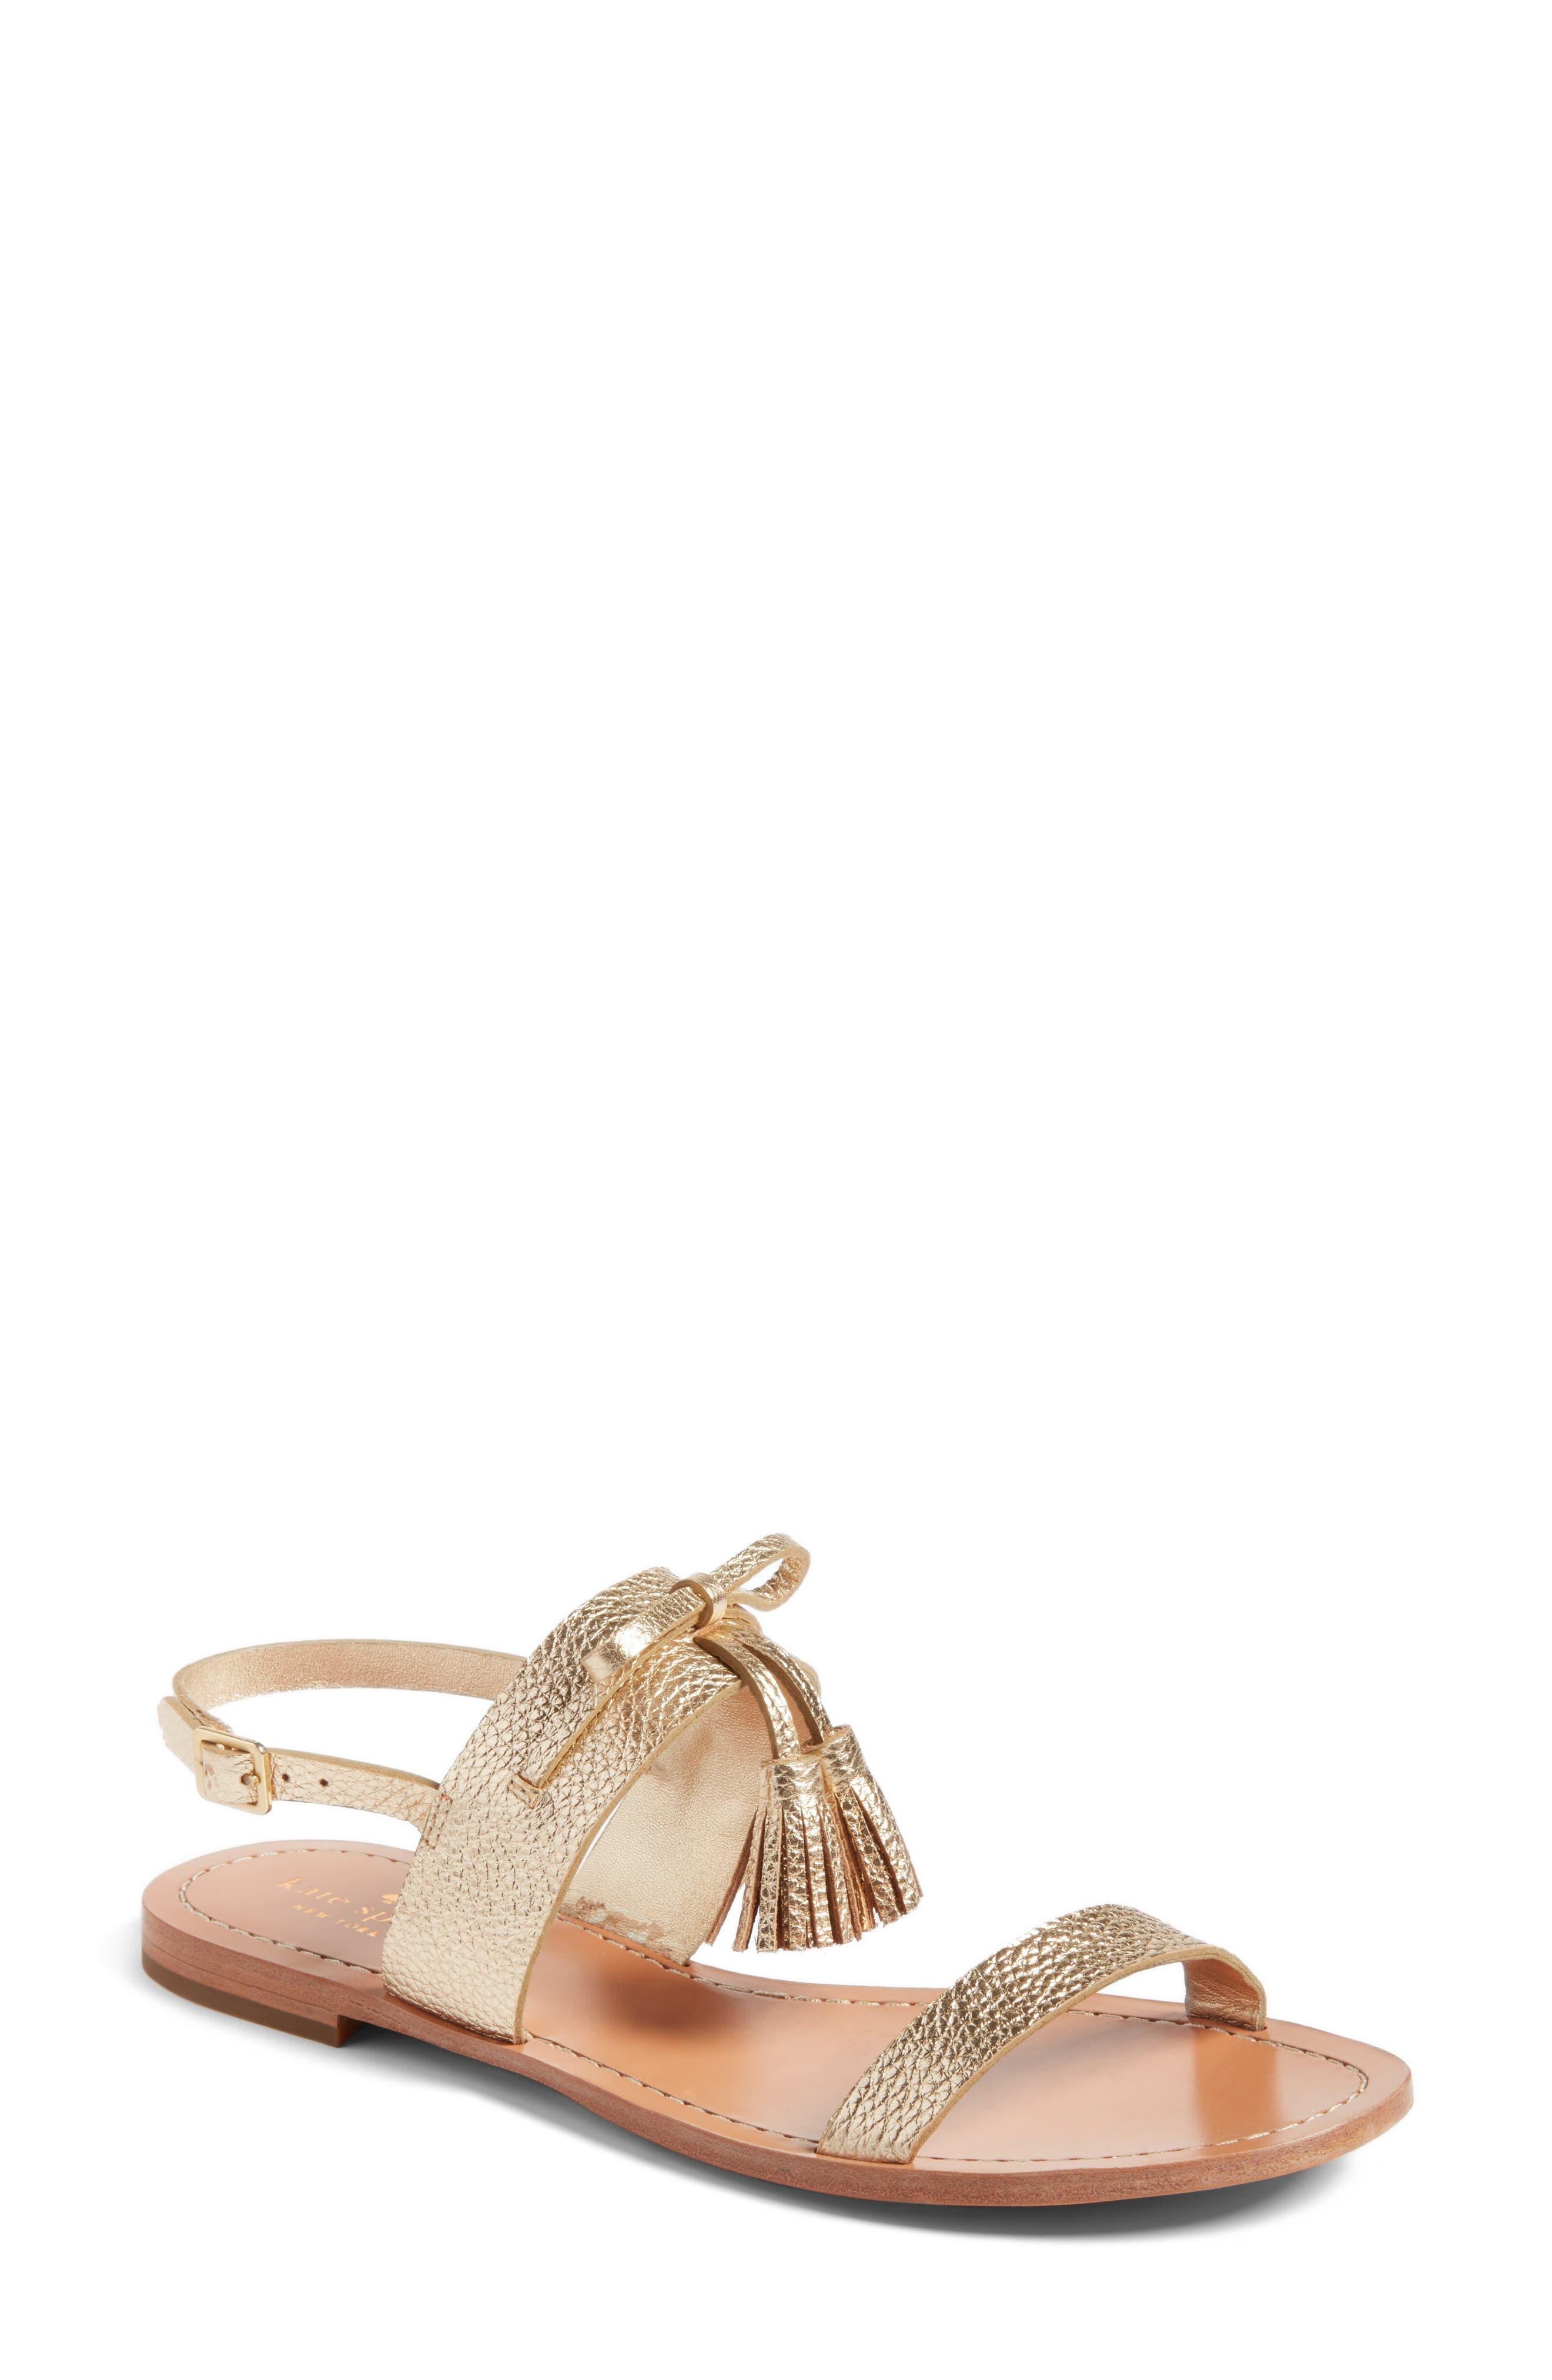 Alternate Image 1 Selected - kate spade new york carlita tassel sandal (Women)